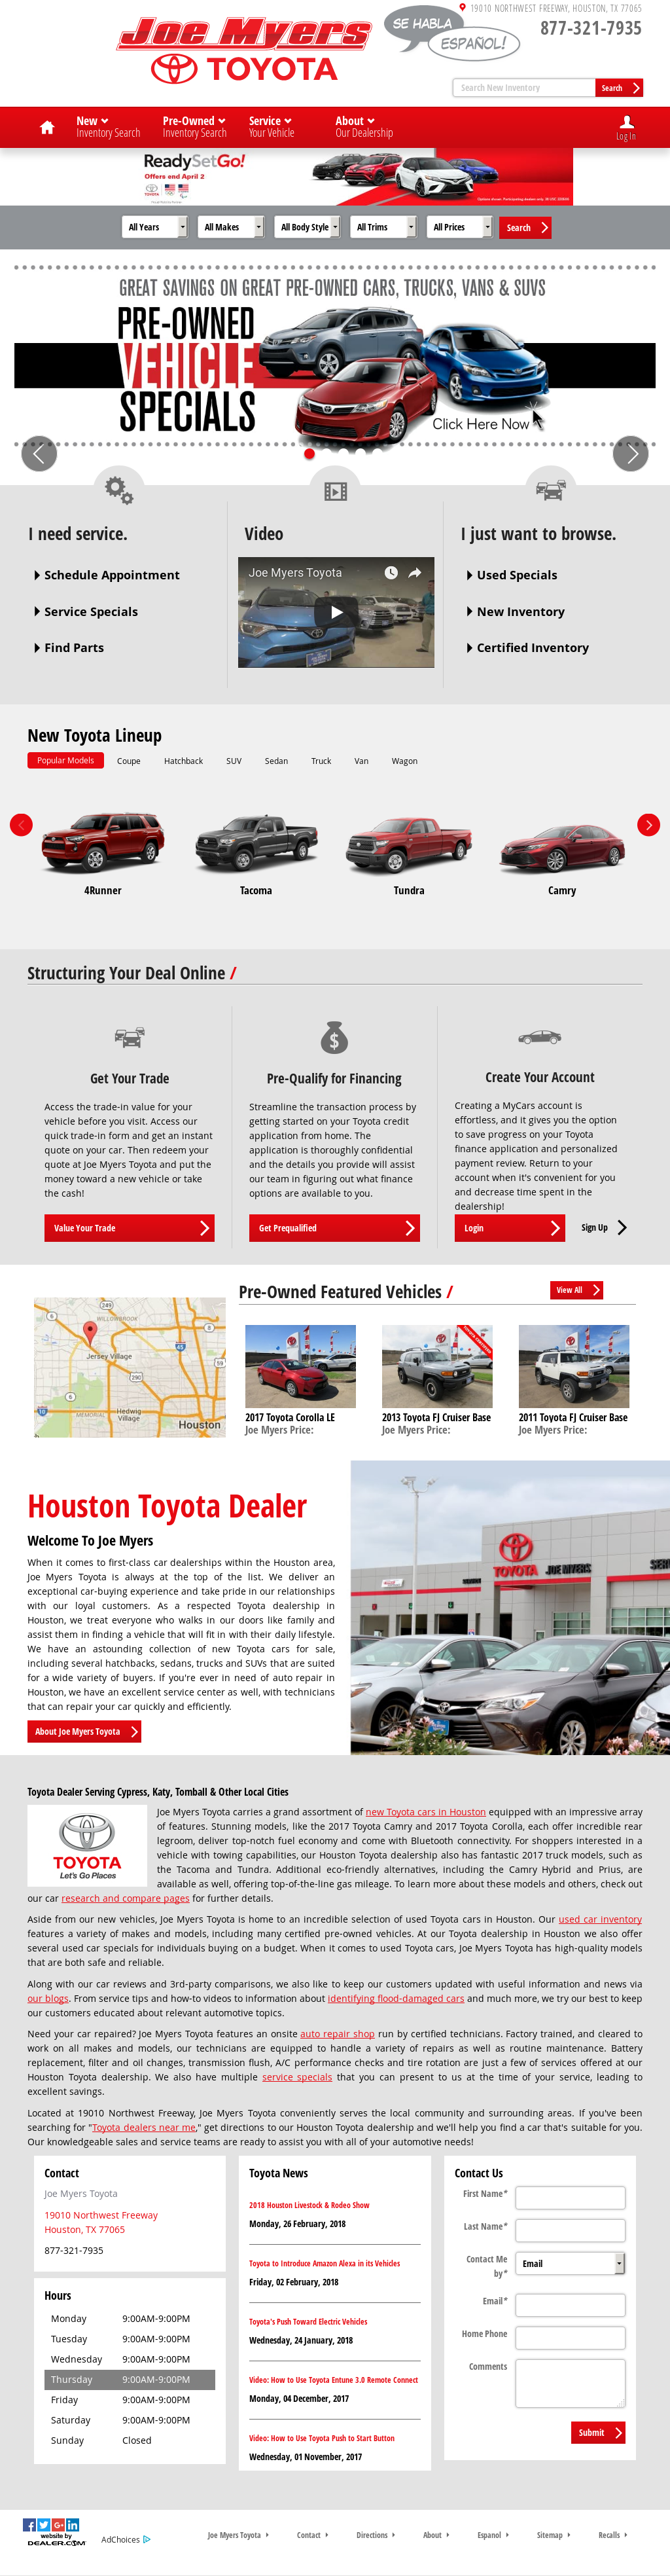 Joe Myers Toyota Website History